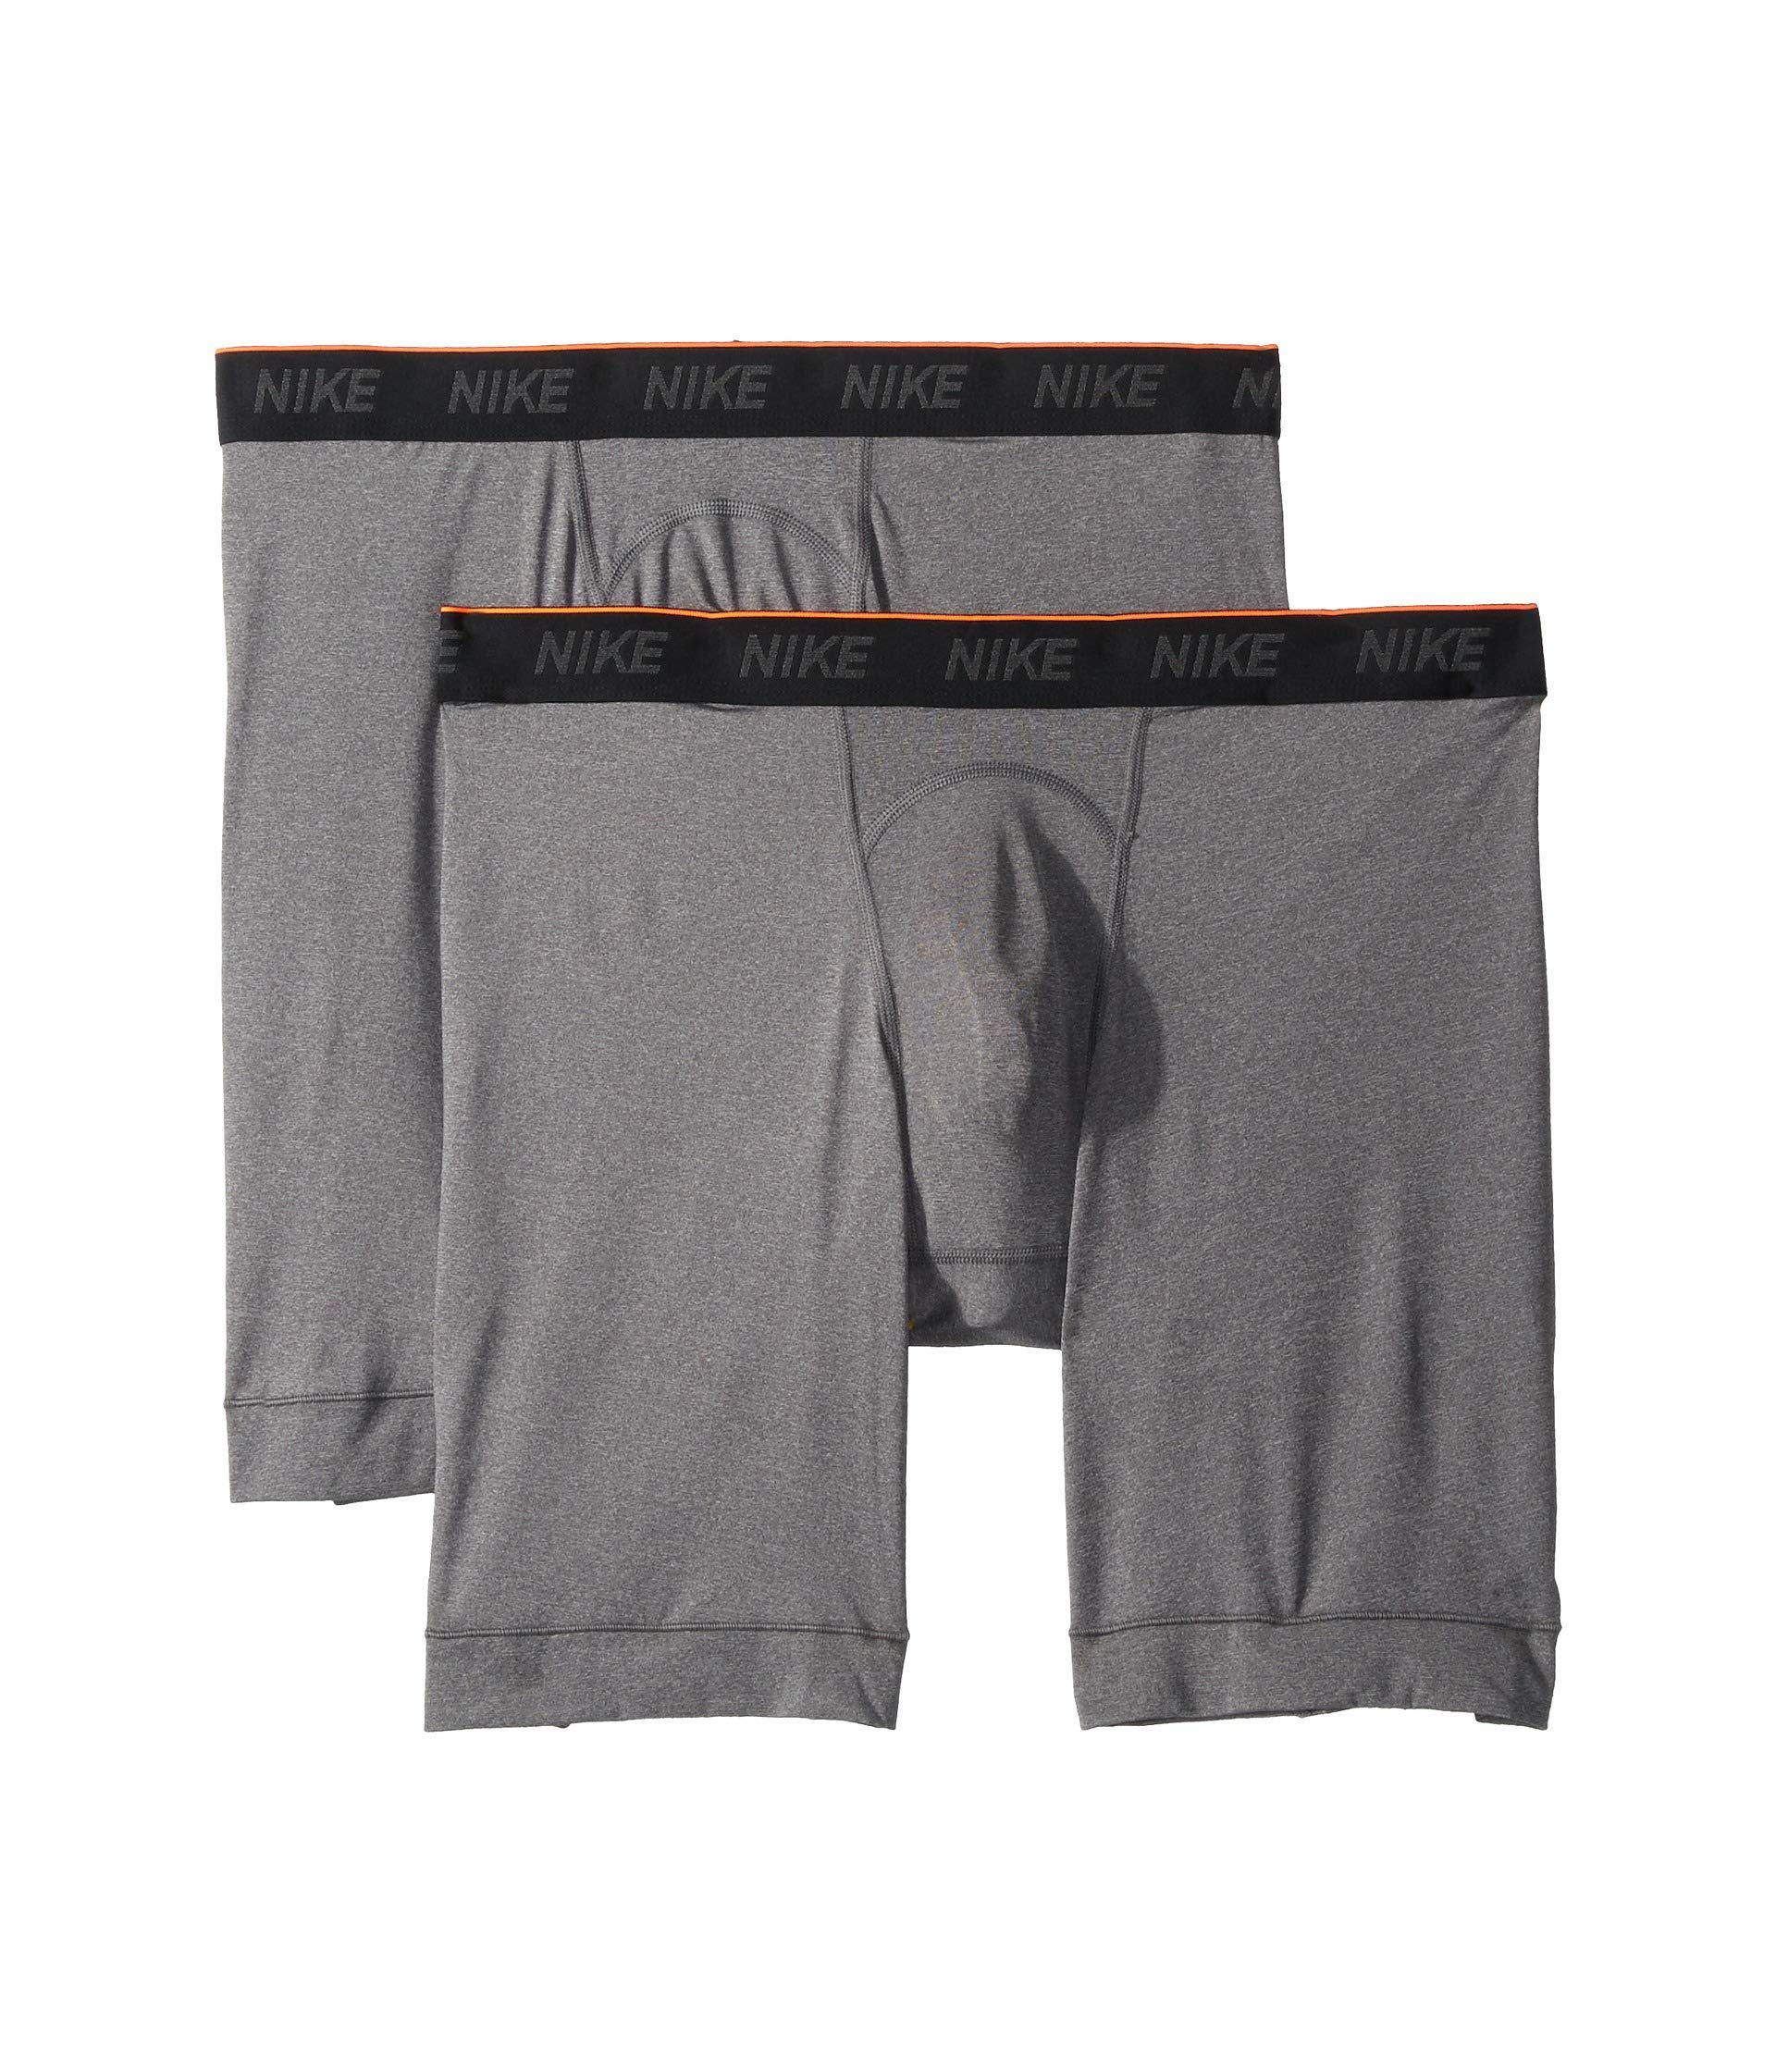 official photos b8095 62ecd Nike Brief Long 2-pair Pack (anthracite black white) Men s Underwear ...